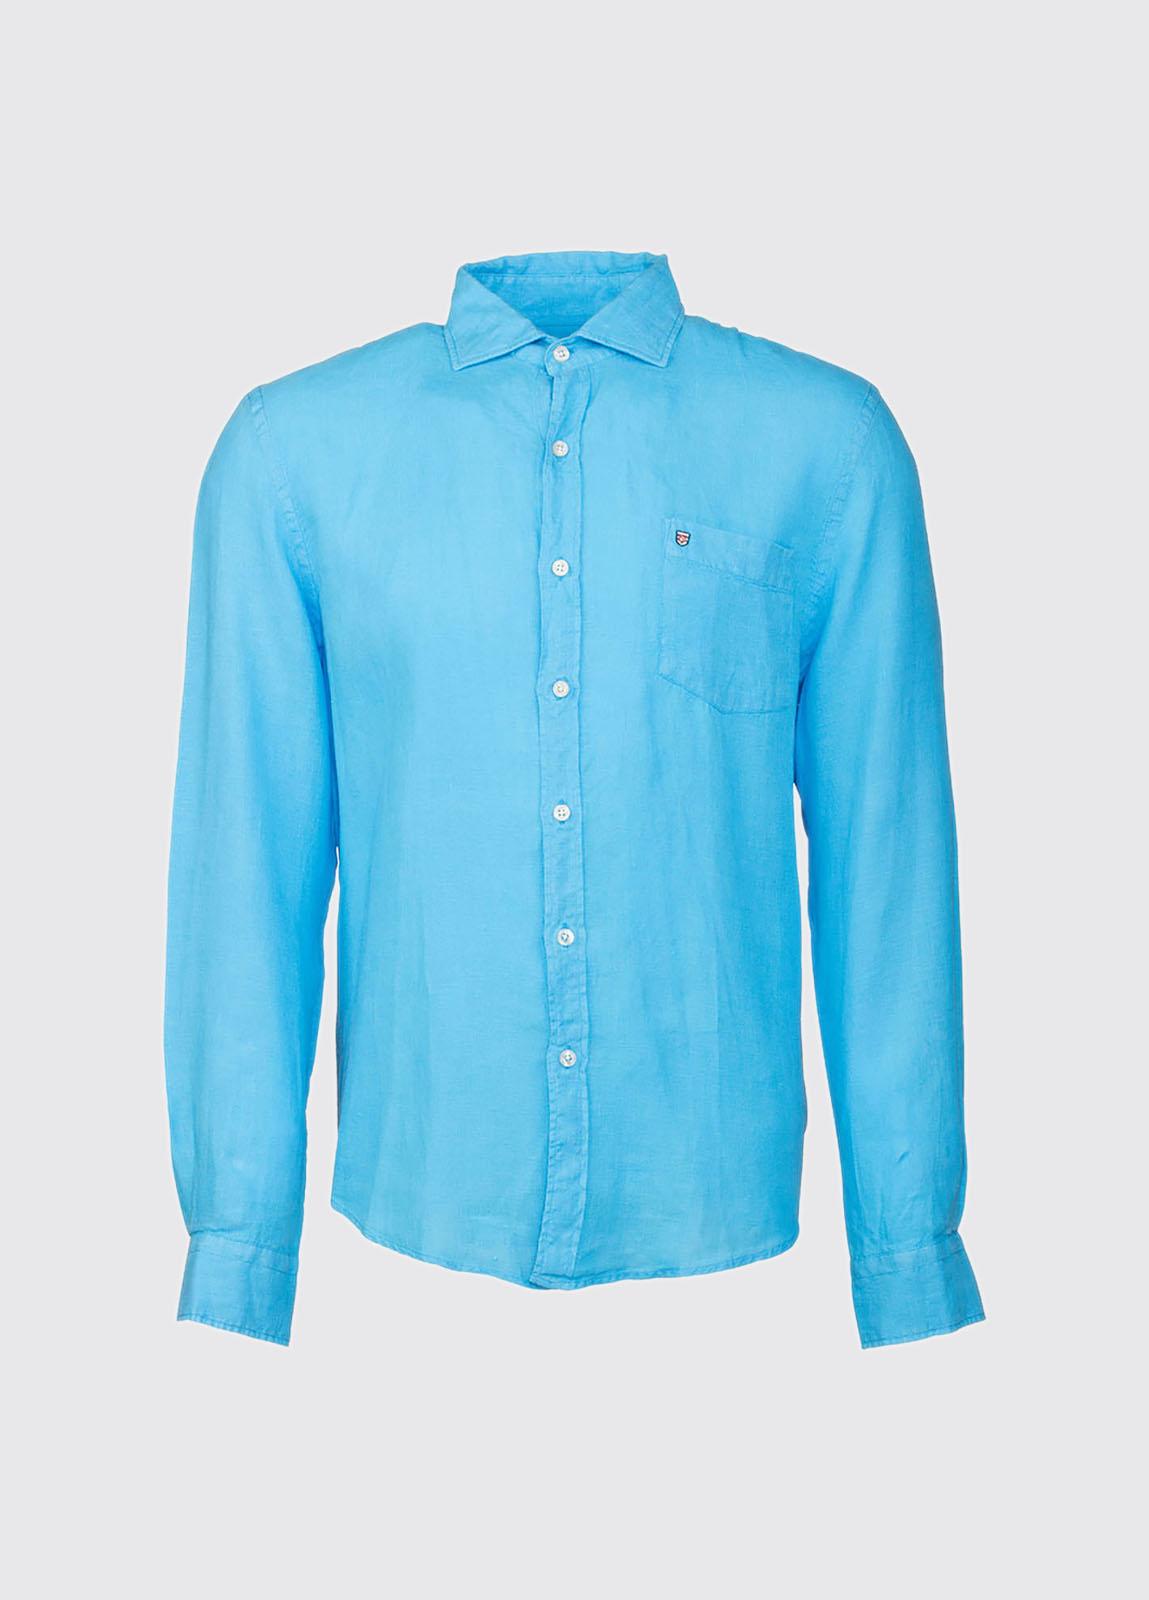 Midleton Mens Shirt - Blue